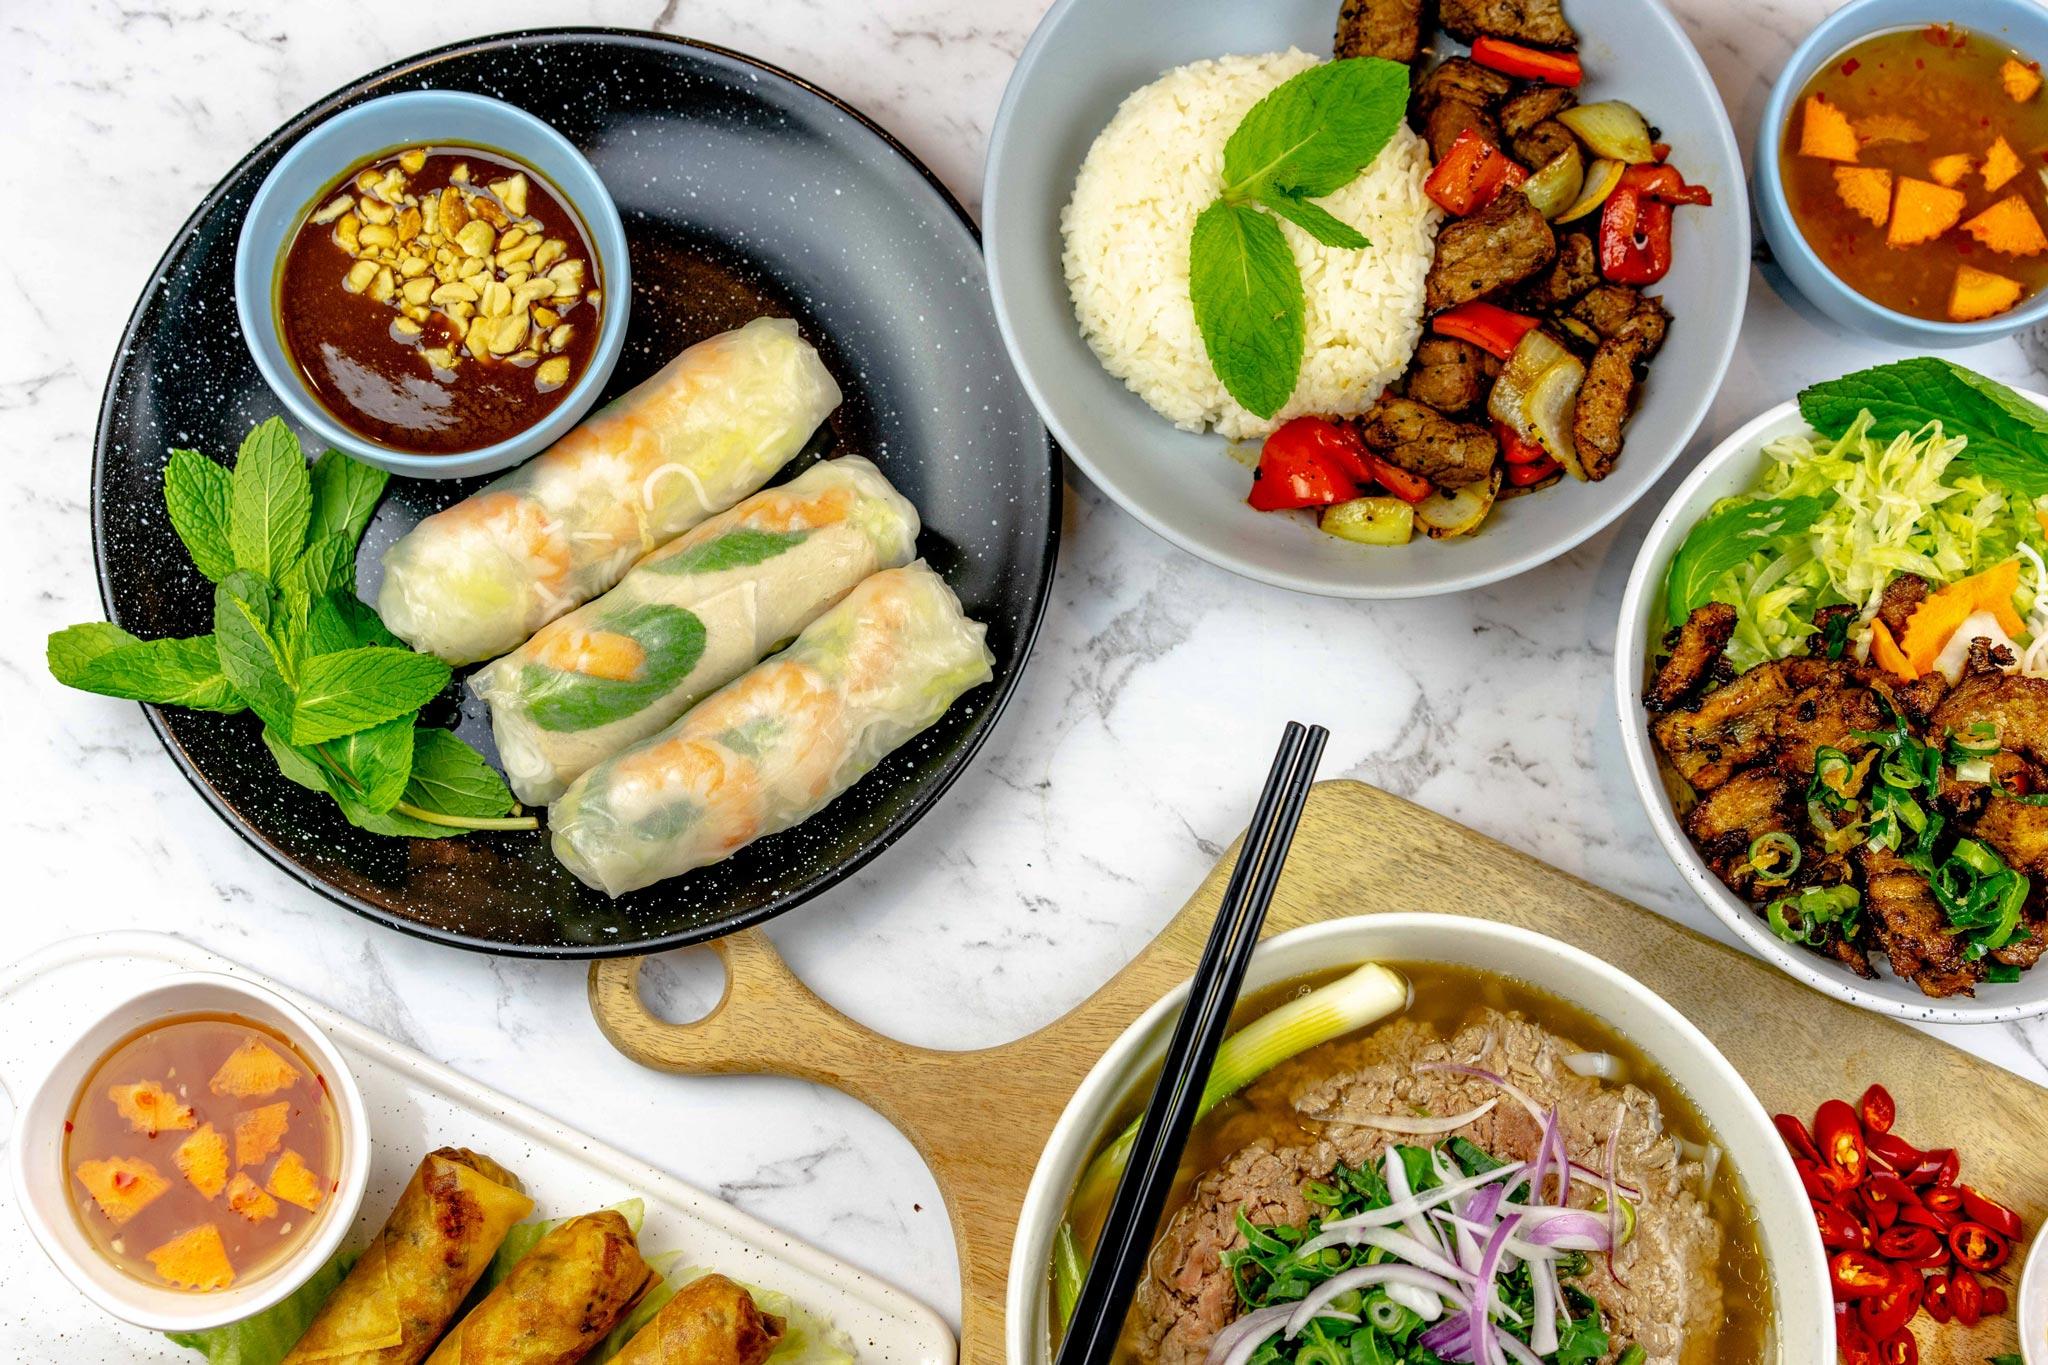 PhoMeOi_FoodImages-15.jpg